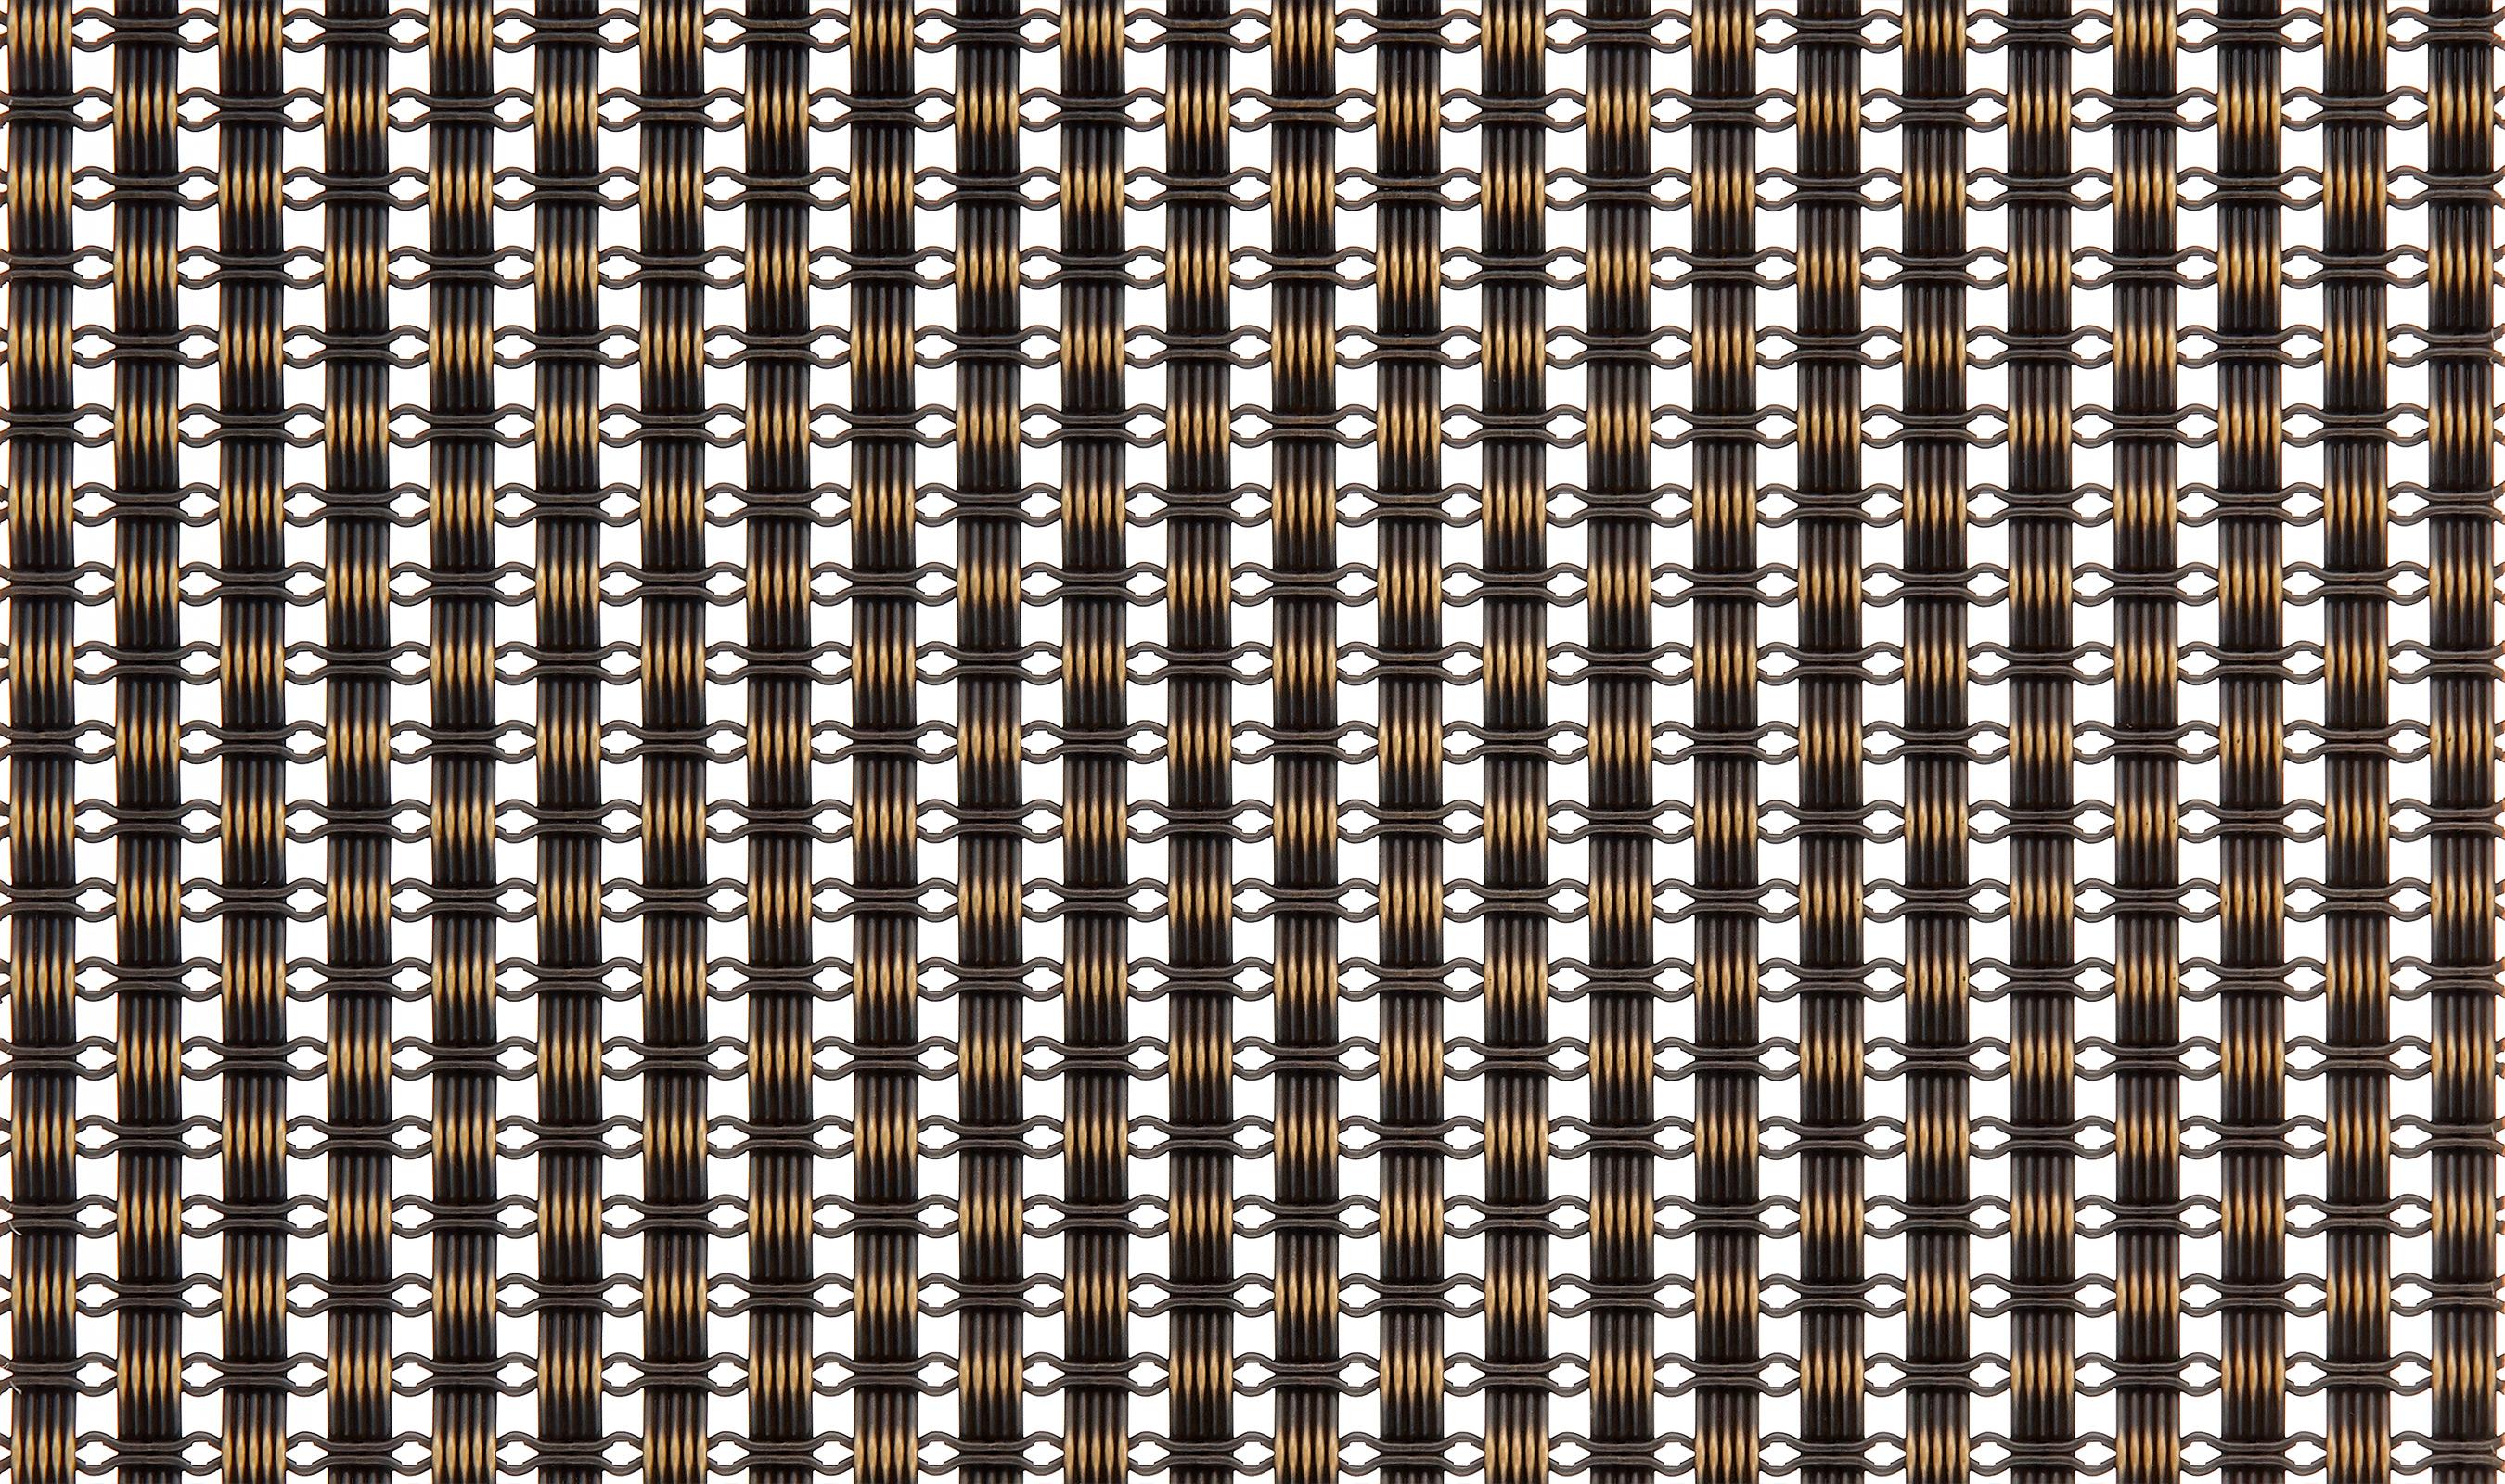 FXZ-1 Decorative Plated Wire Mesh Pattern in Antique Brass